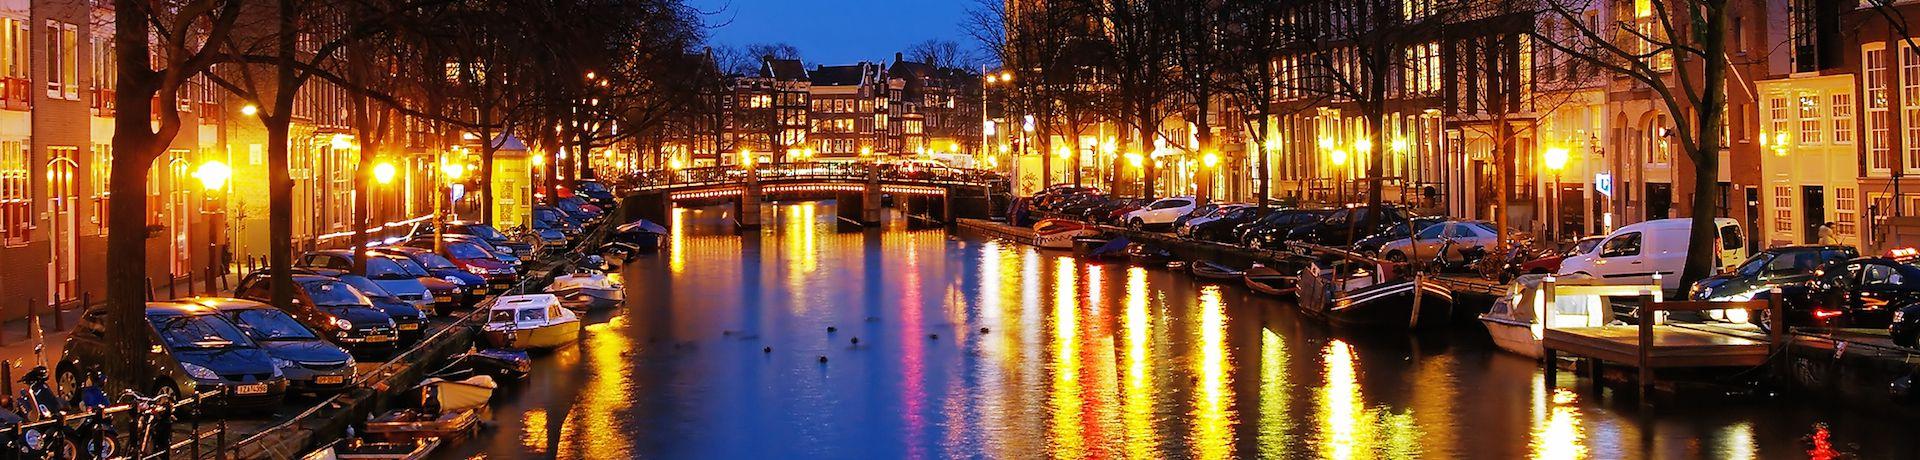 Supertrips - Design Hotel Amsterdam